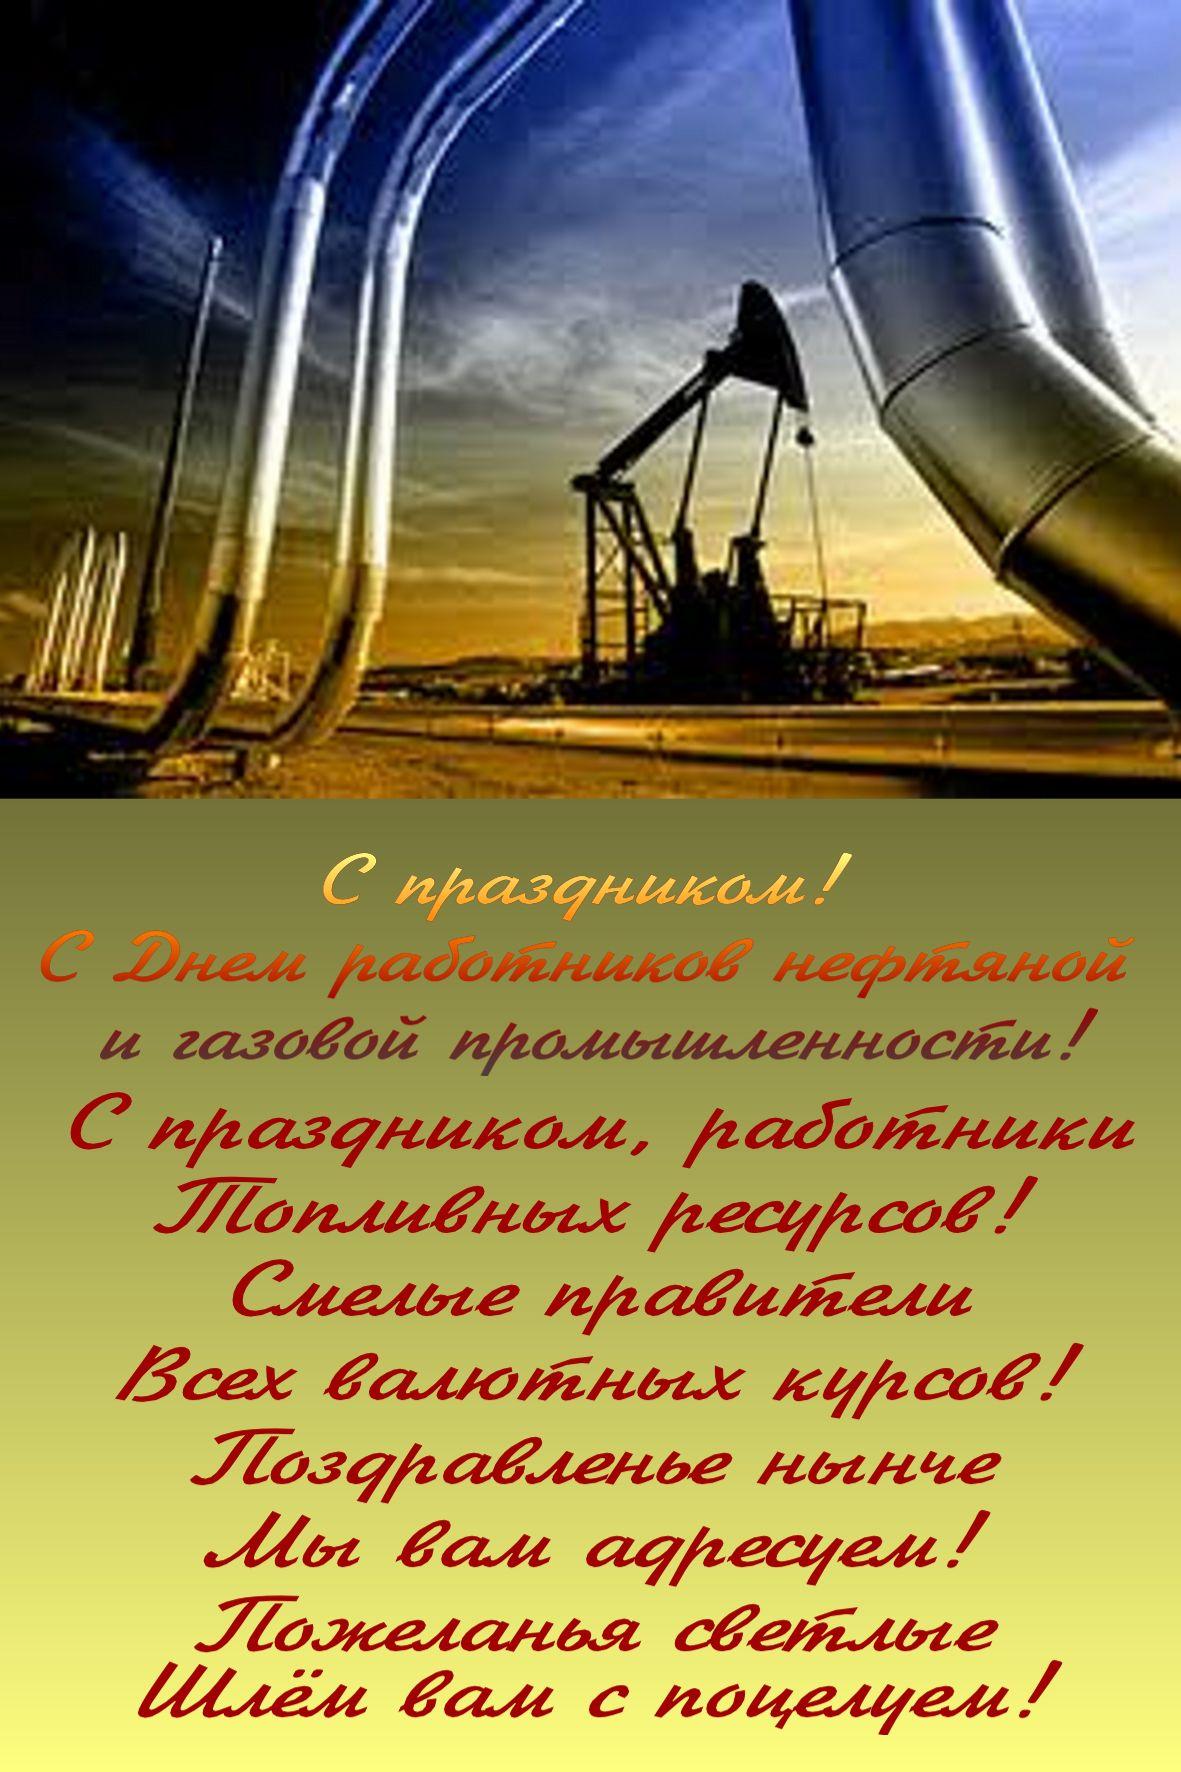 открытка с днем нефтяника фото